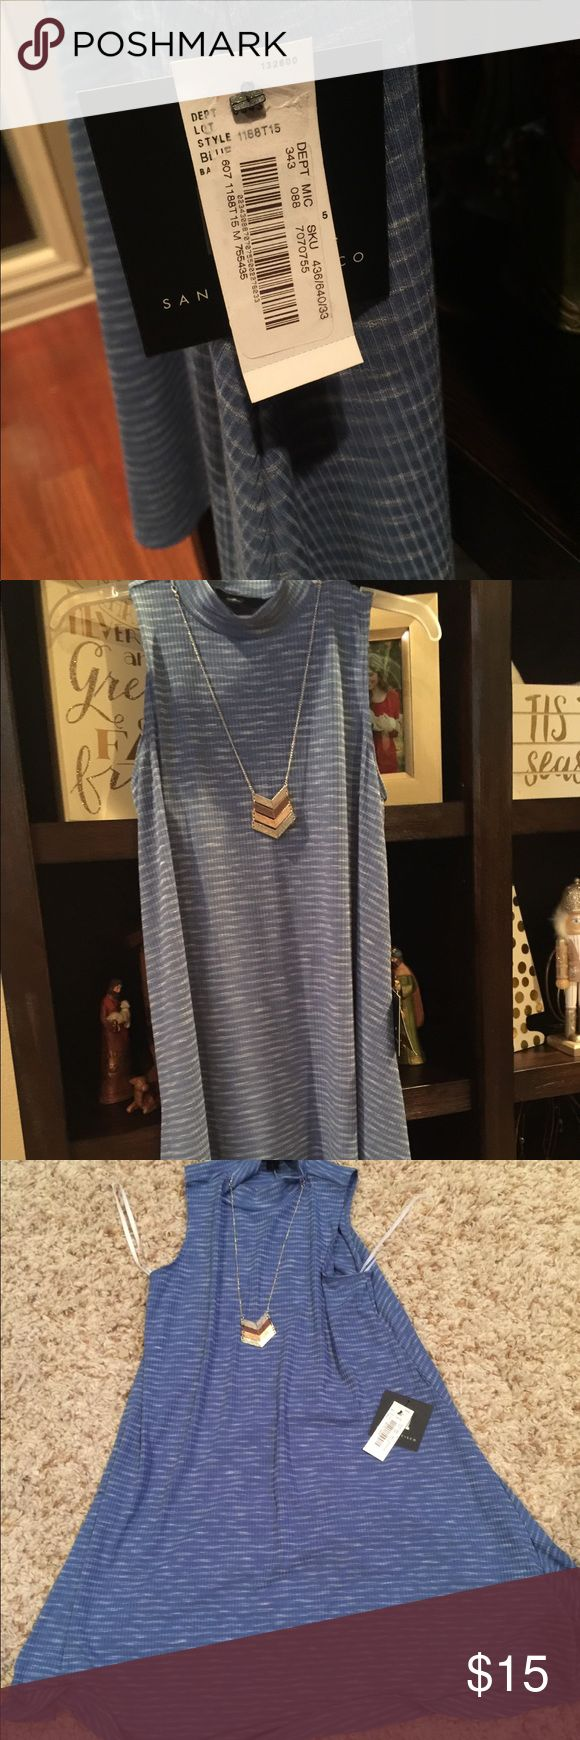 Sleeveless high neck dress Classy sleeveless dress with necklace attached. Never worn, brand new! Smoke free home. dillards Dresses Midi